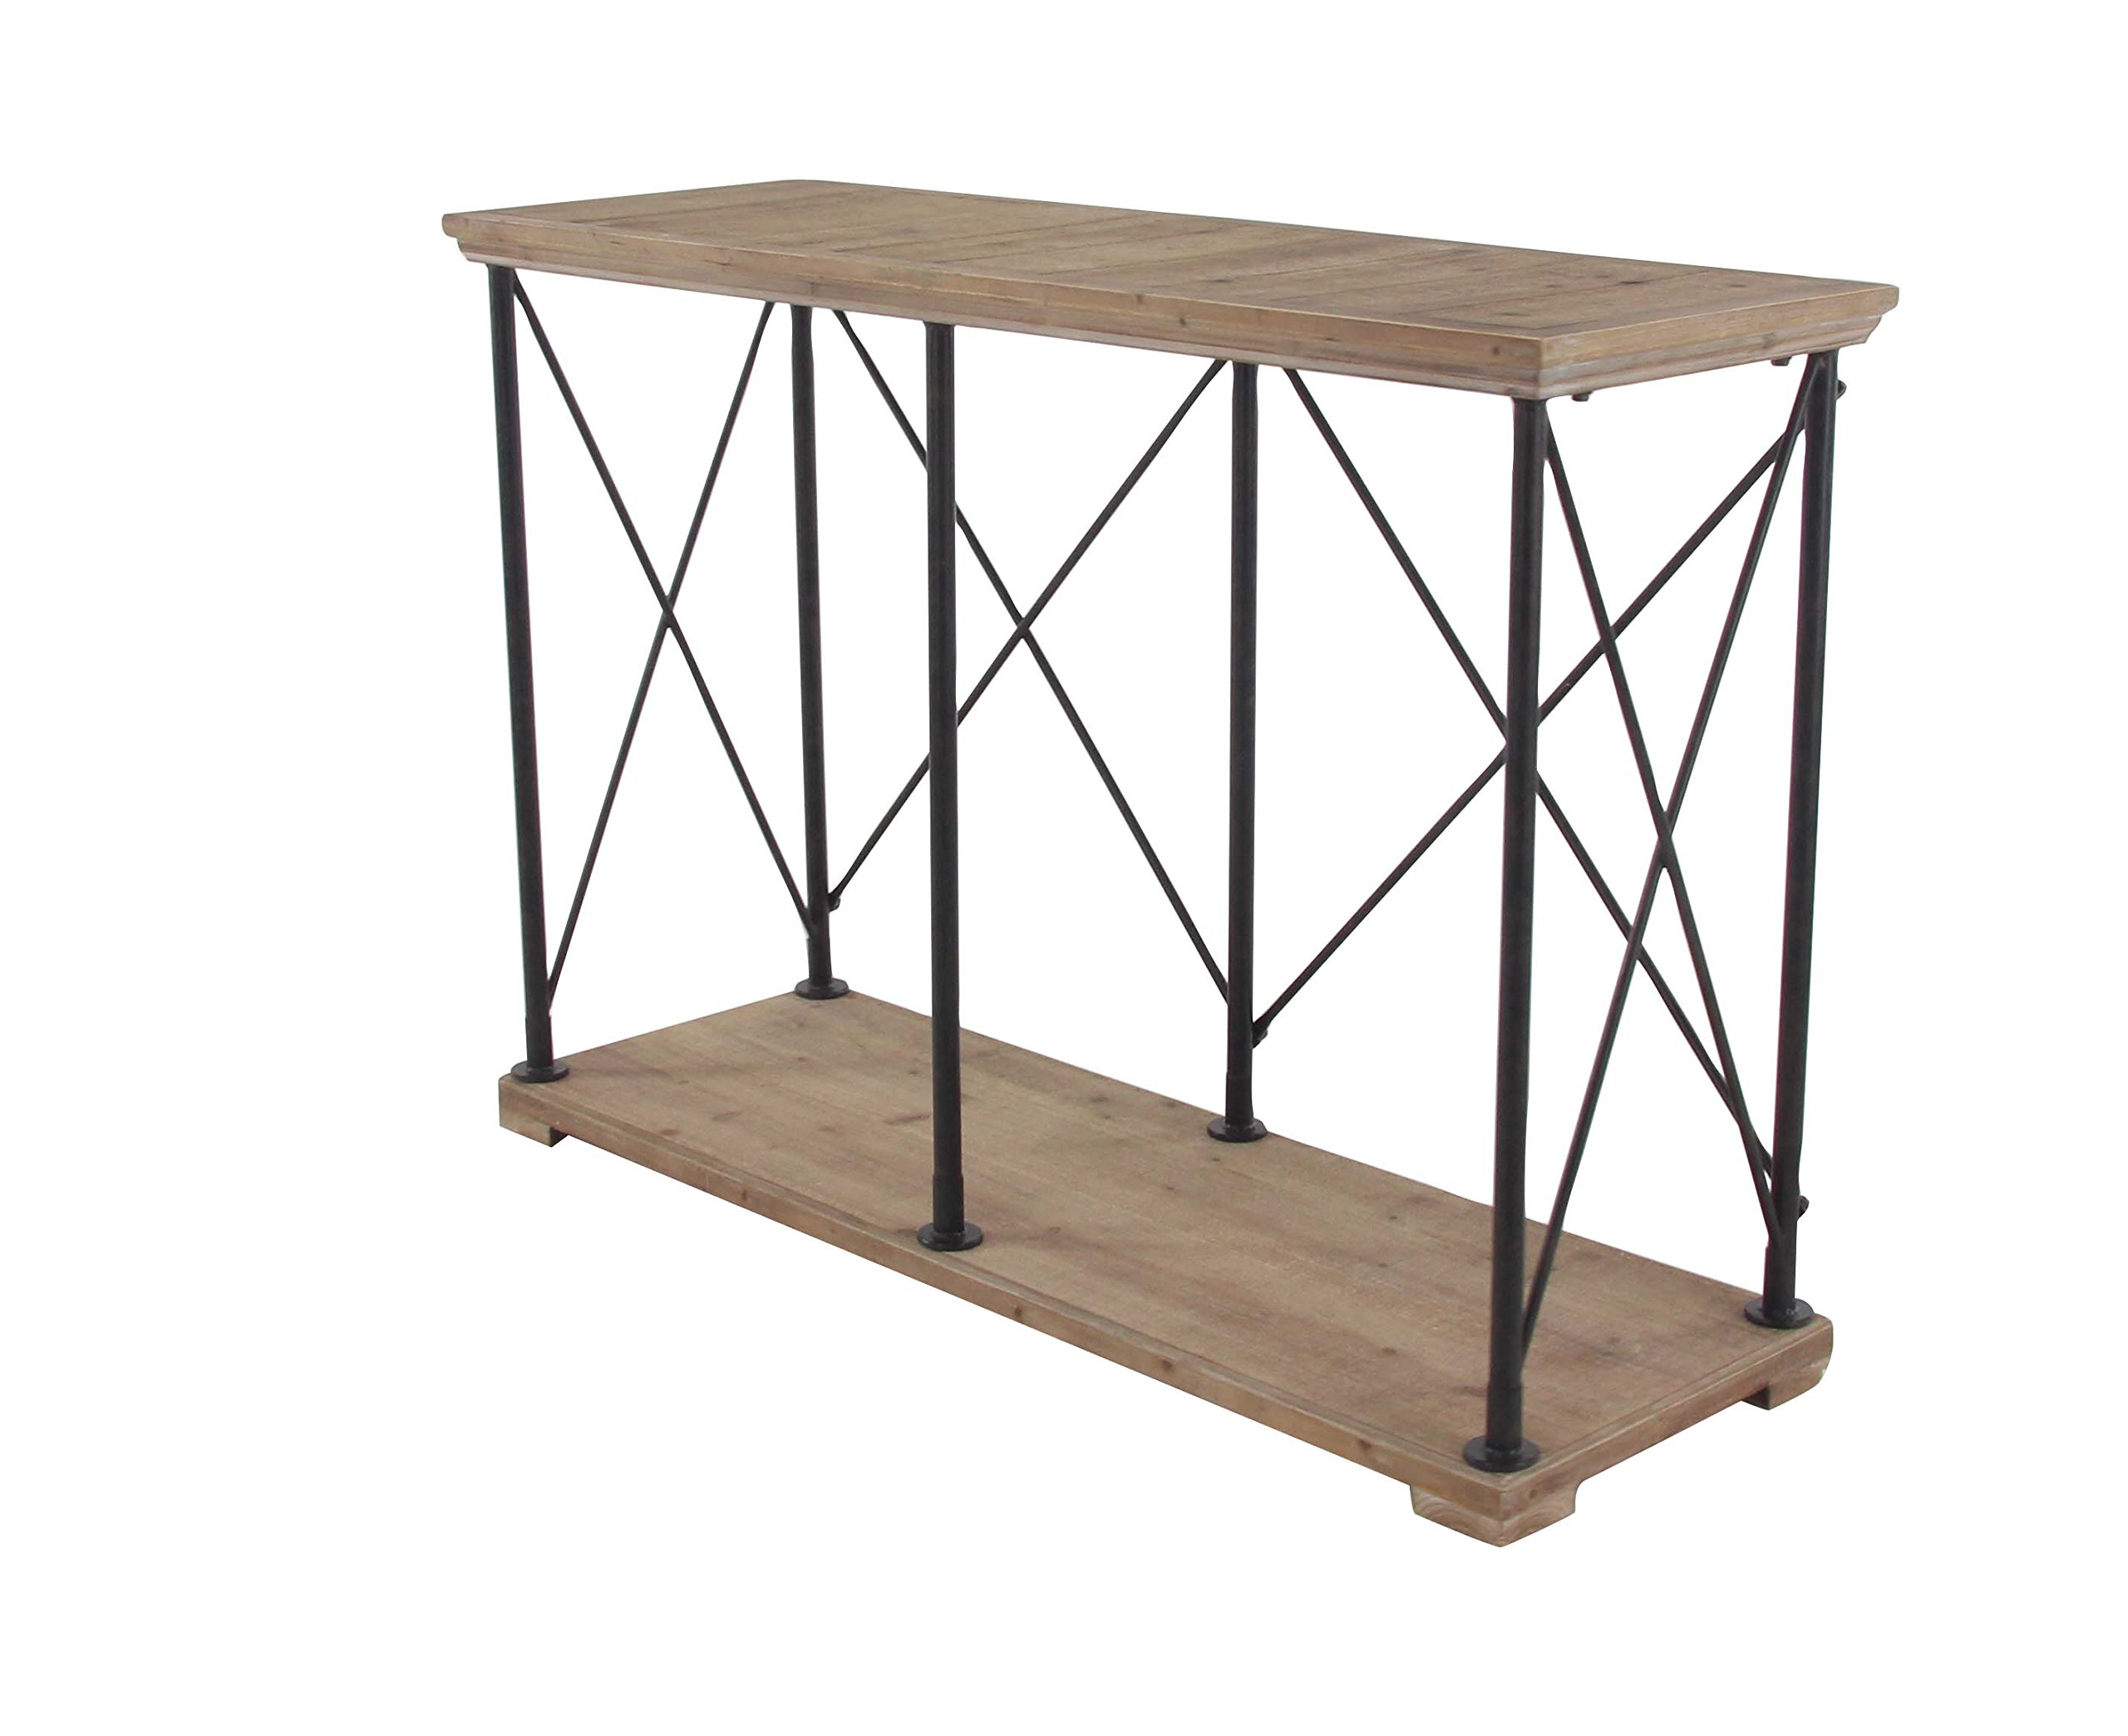 Deco 79 44470 Console Table, Black/Brown